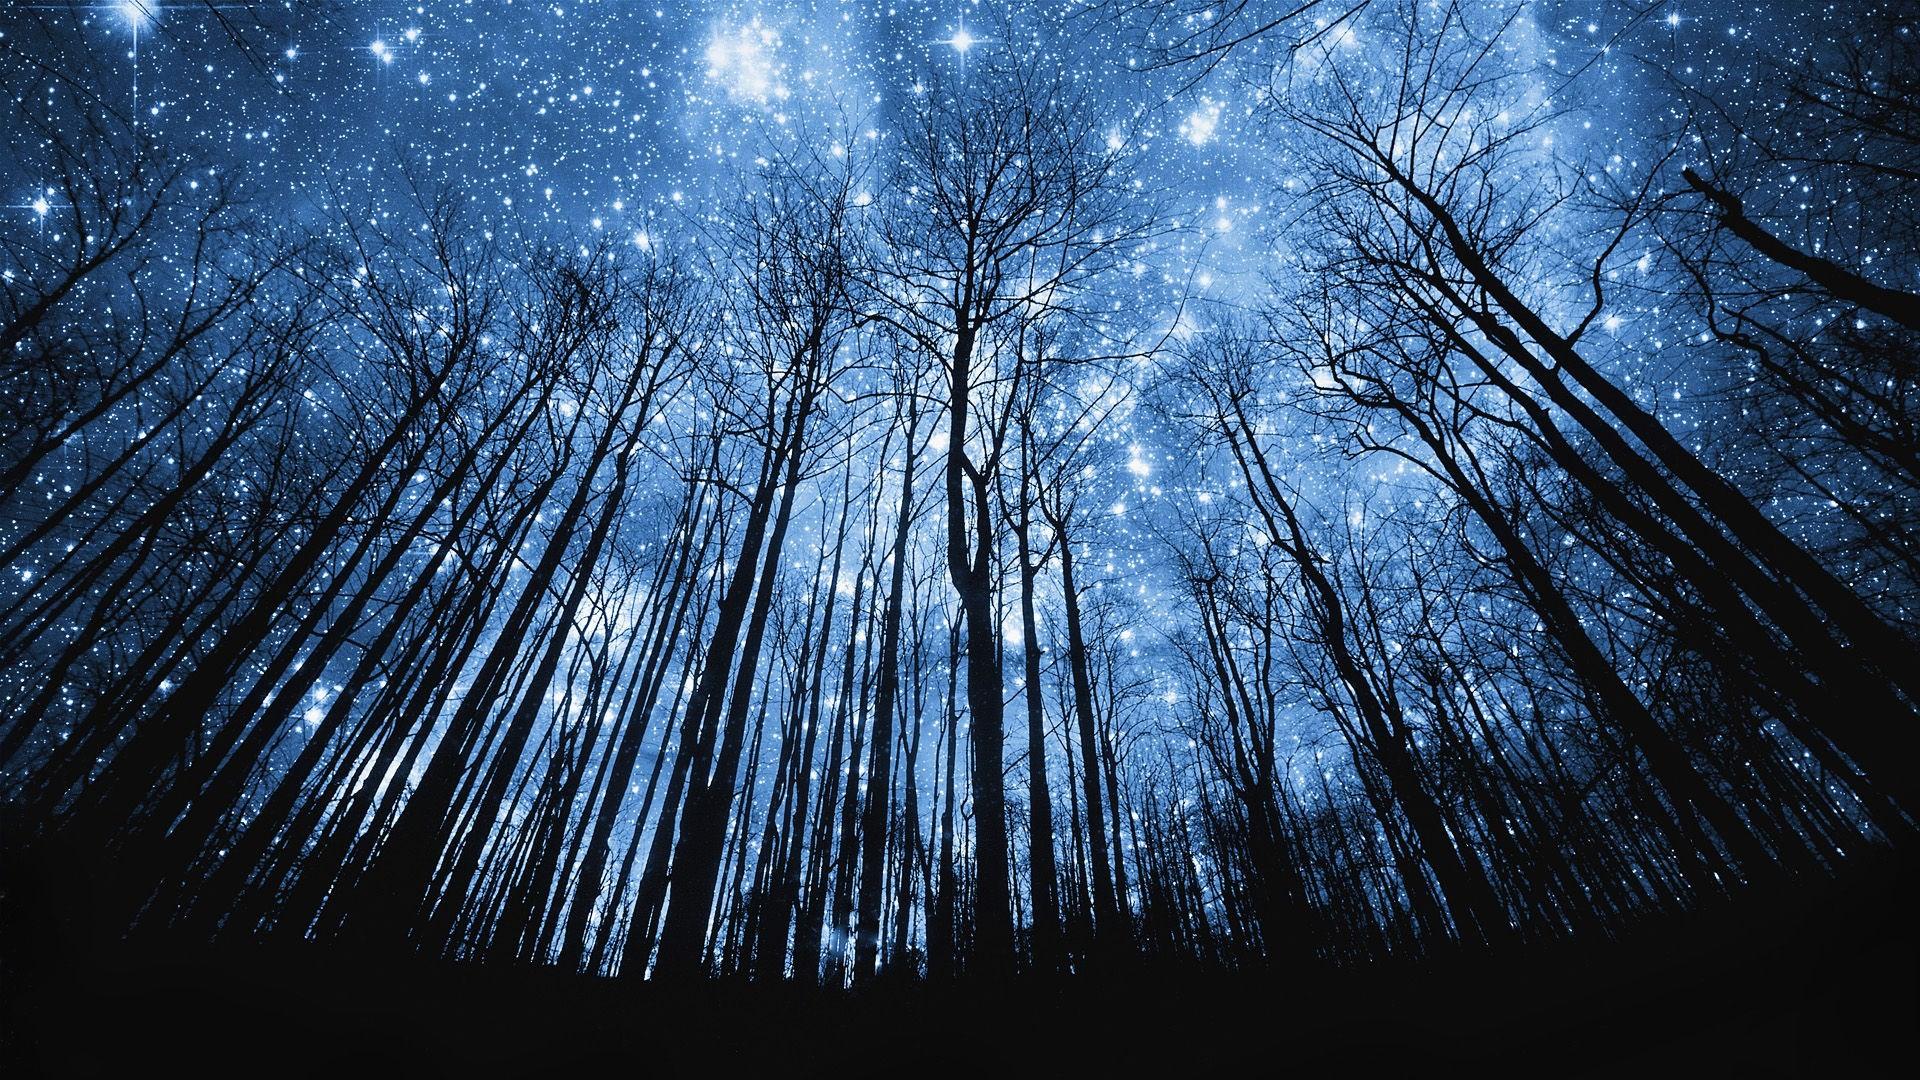 Beautiful Night Sky wallpapers hd